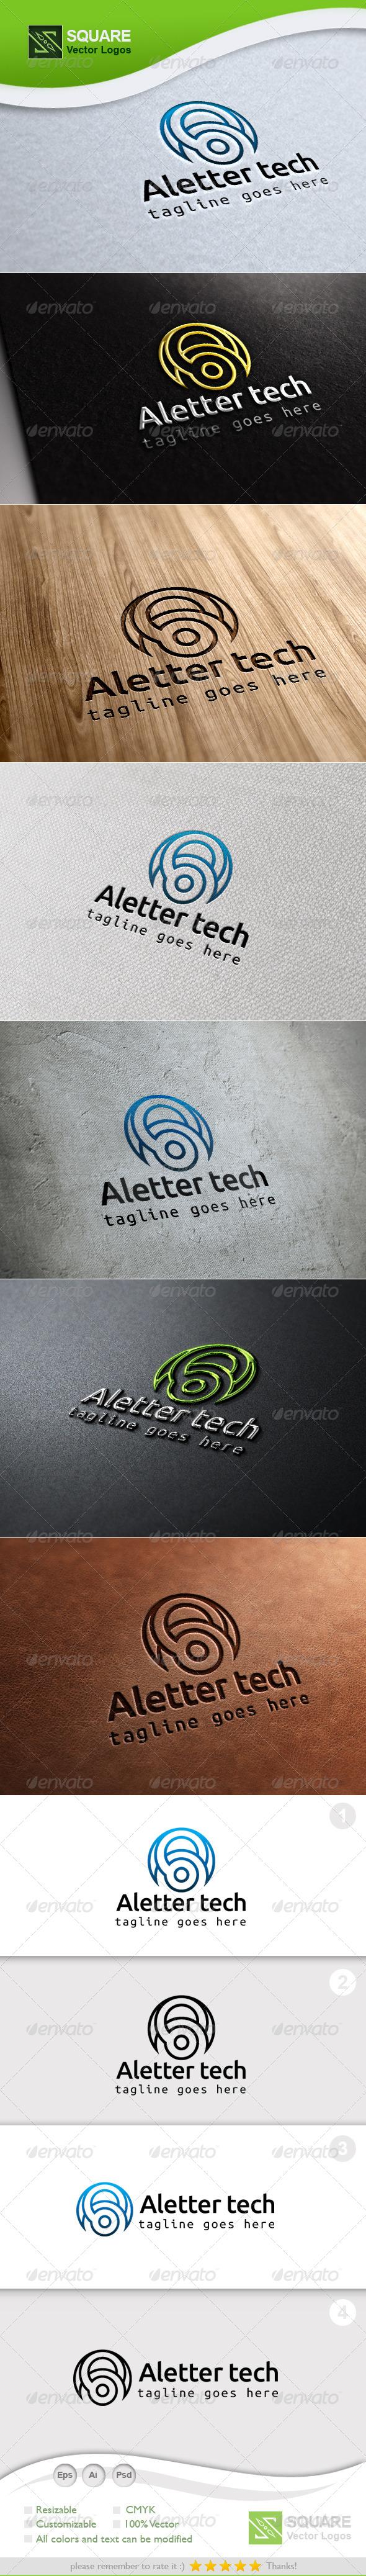 A, Technology Vector Logo Template